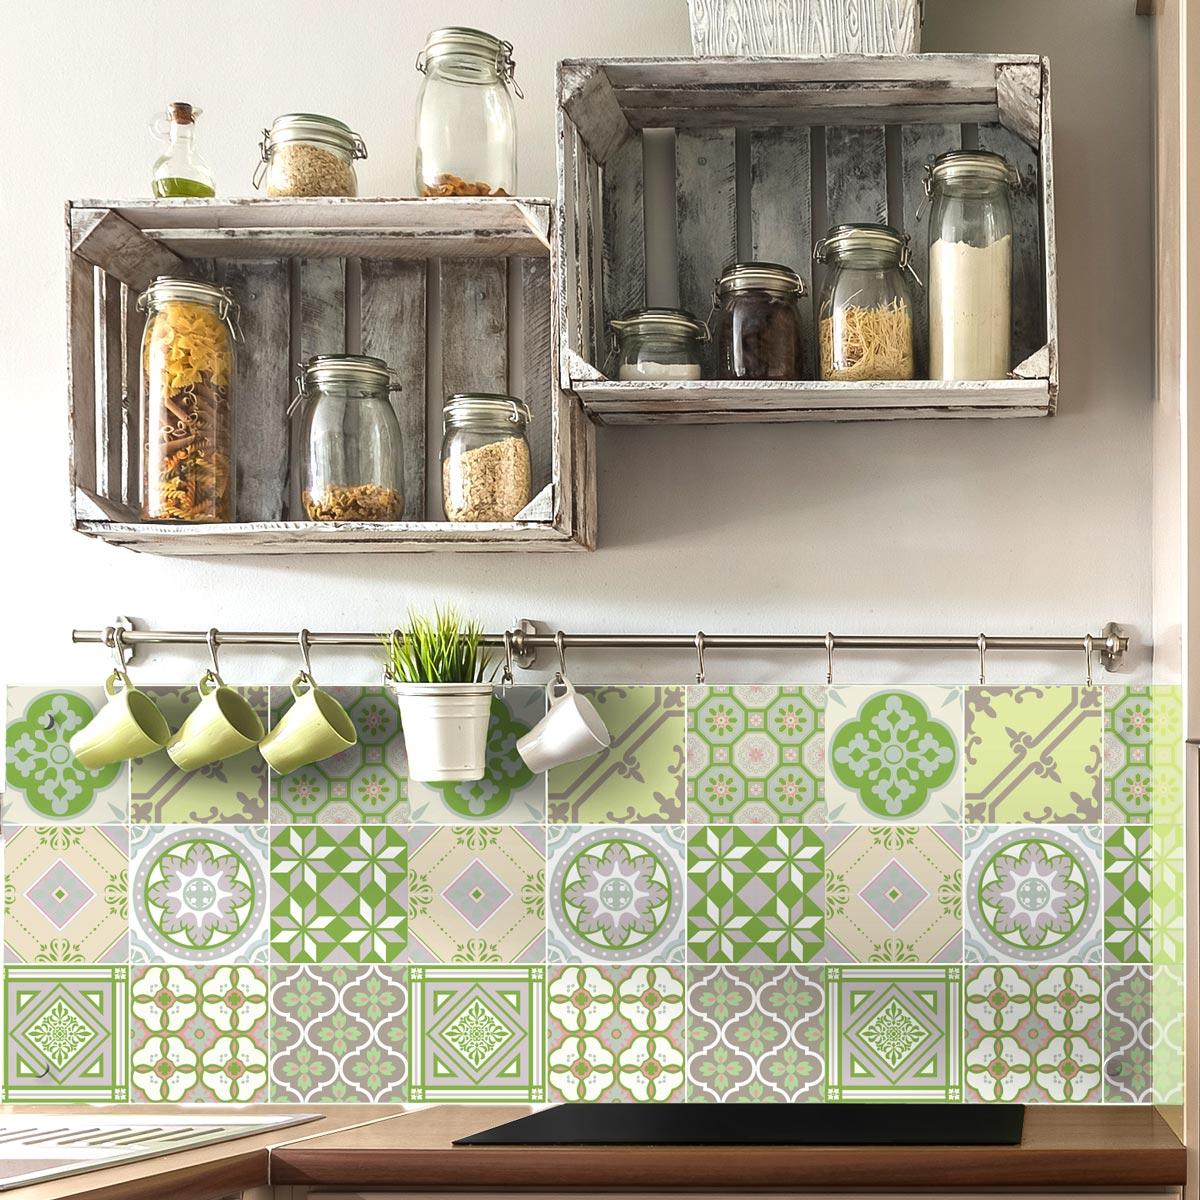 Beaufiful stickers carrelage cuisine 15x15 photos for Carrelage mural salle de bain vert